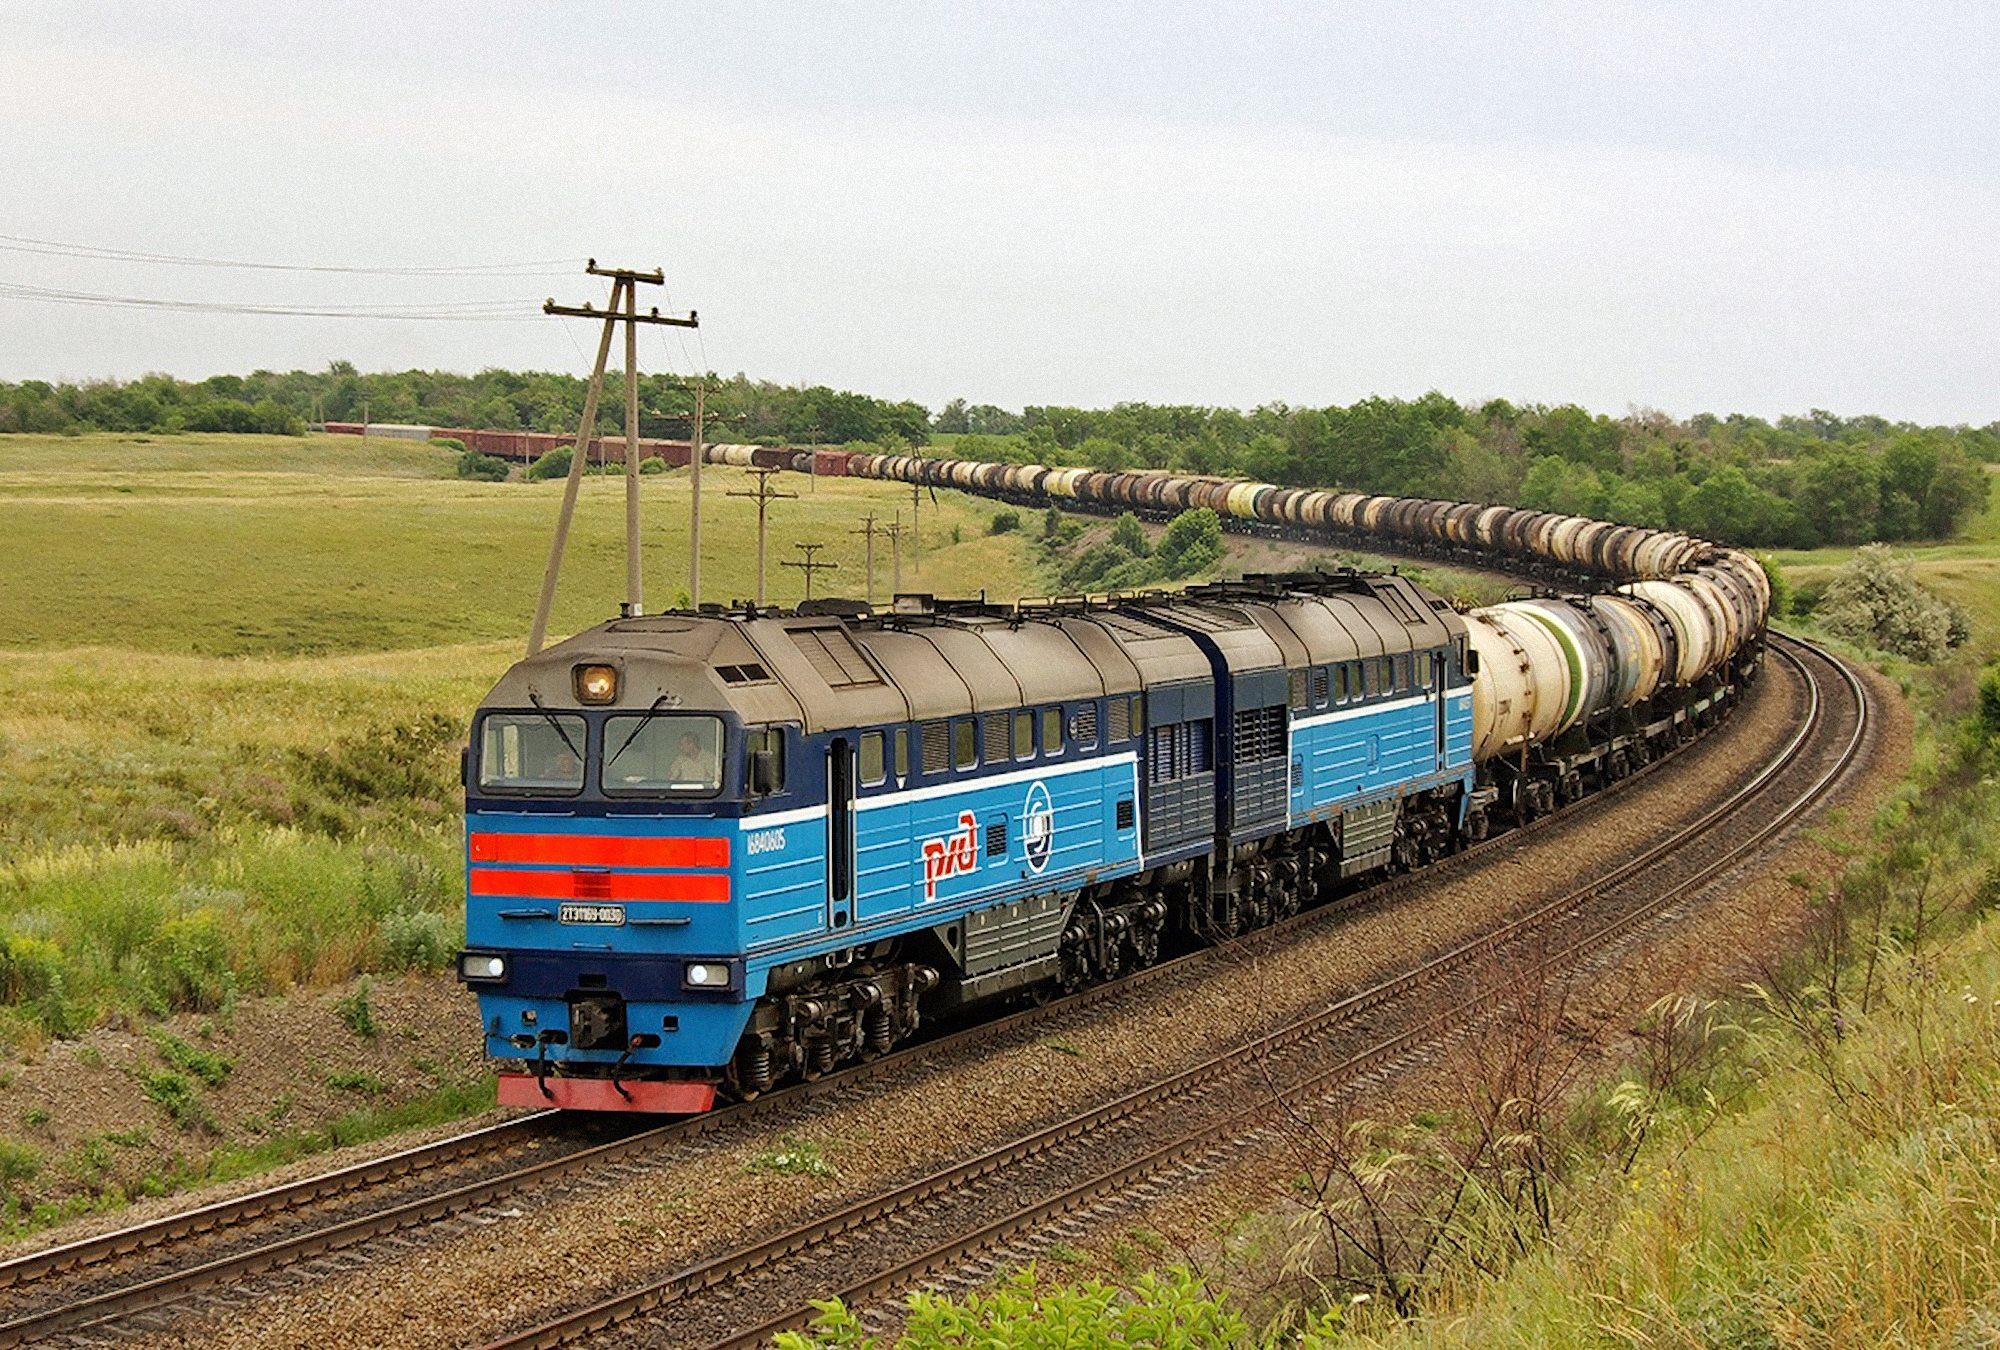 00 russian locomotive. 010715